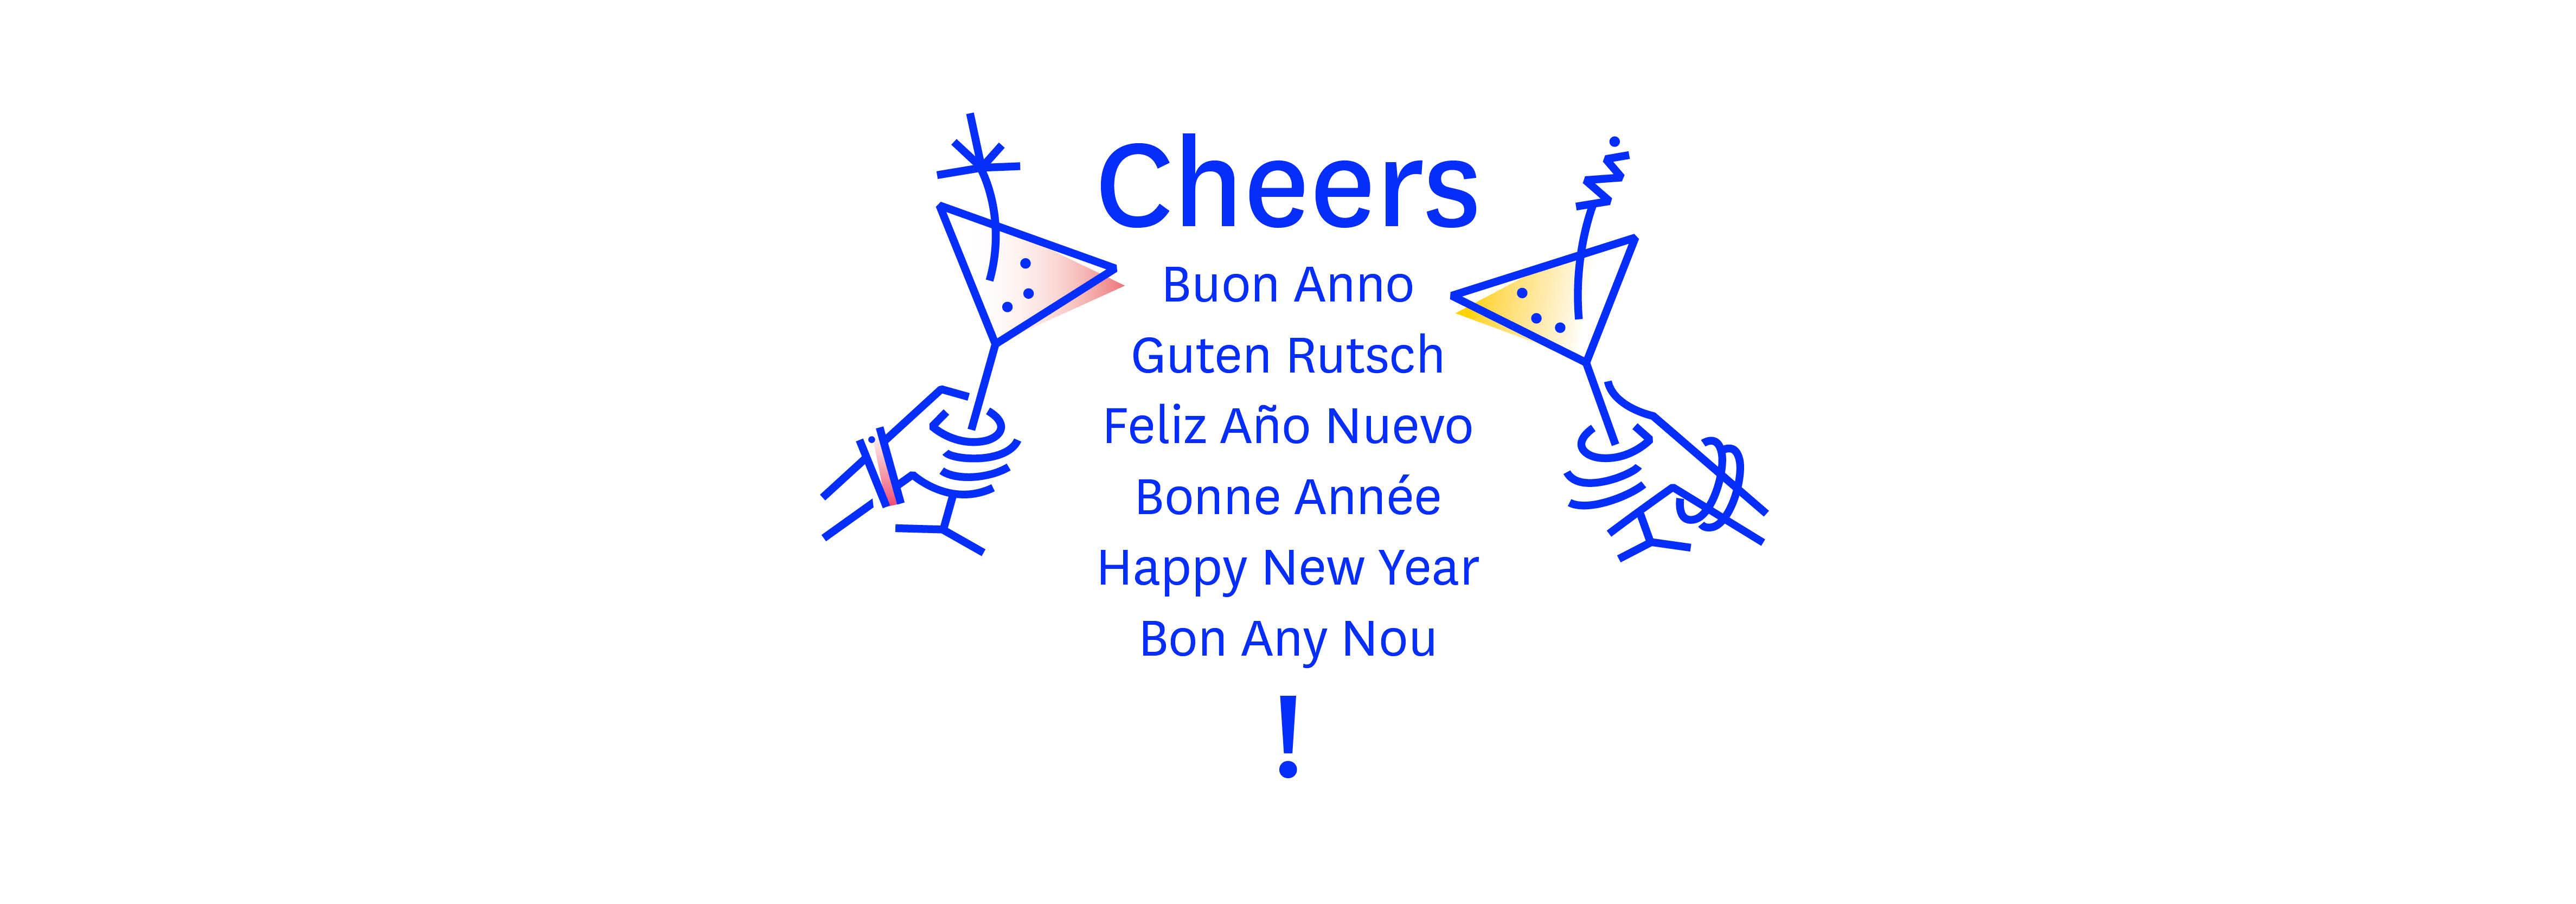 Happy New Year!! | Lucia Pigliapochi